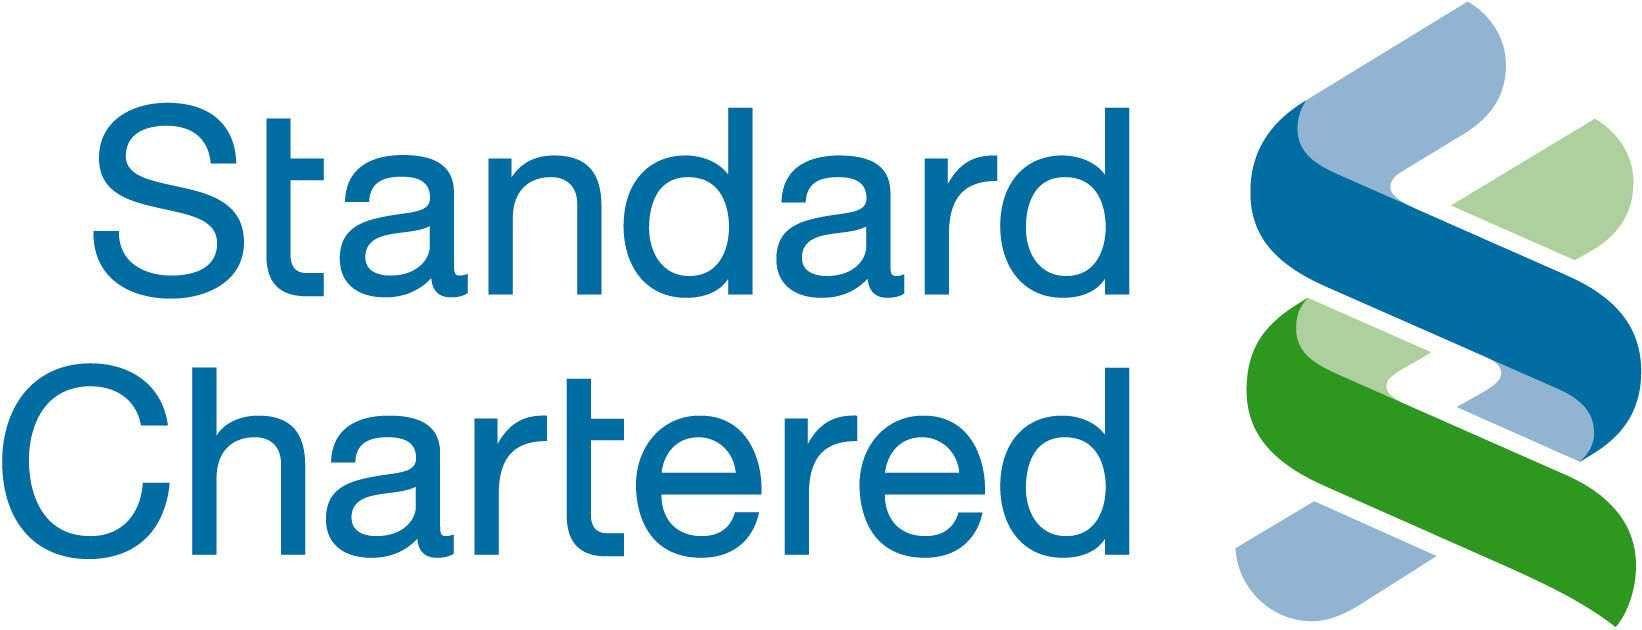 Standard chartered banks logo vector logo bank